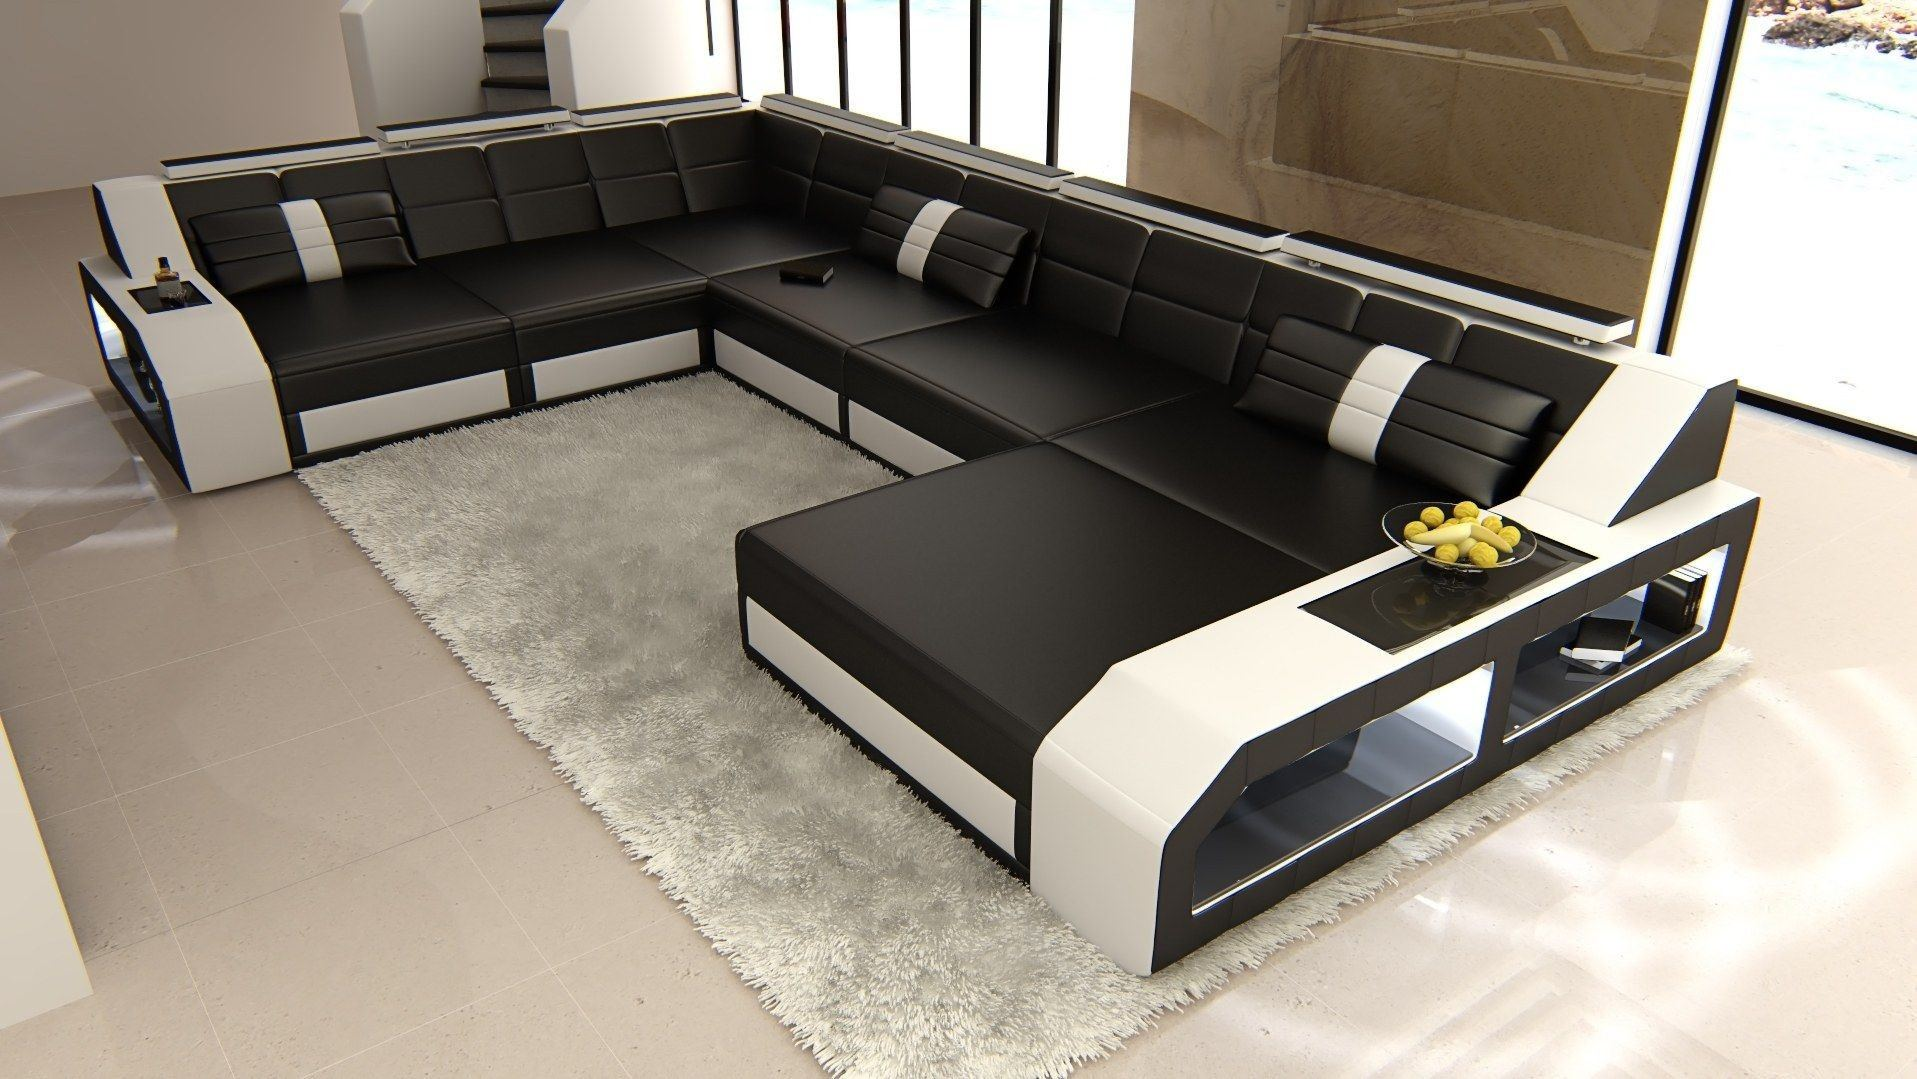 xxl wohnlandschaft matera xxl schwarz weiss. Black Bedroom Furniture Sets. Home Design Ideas